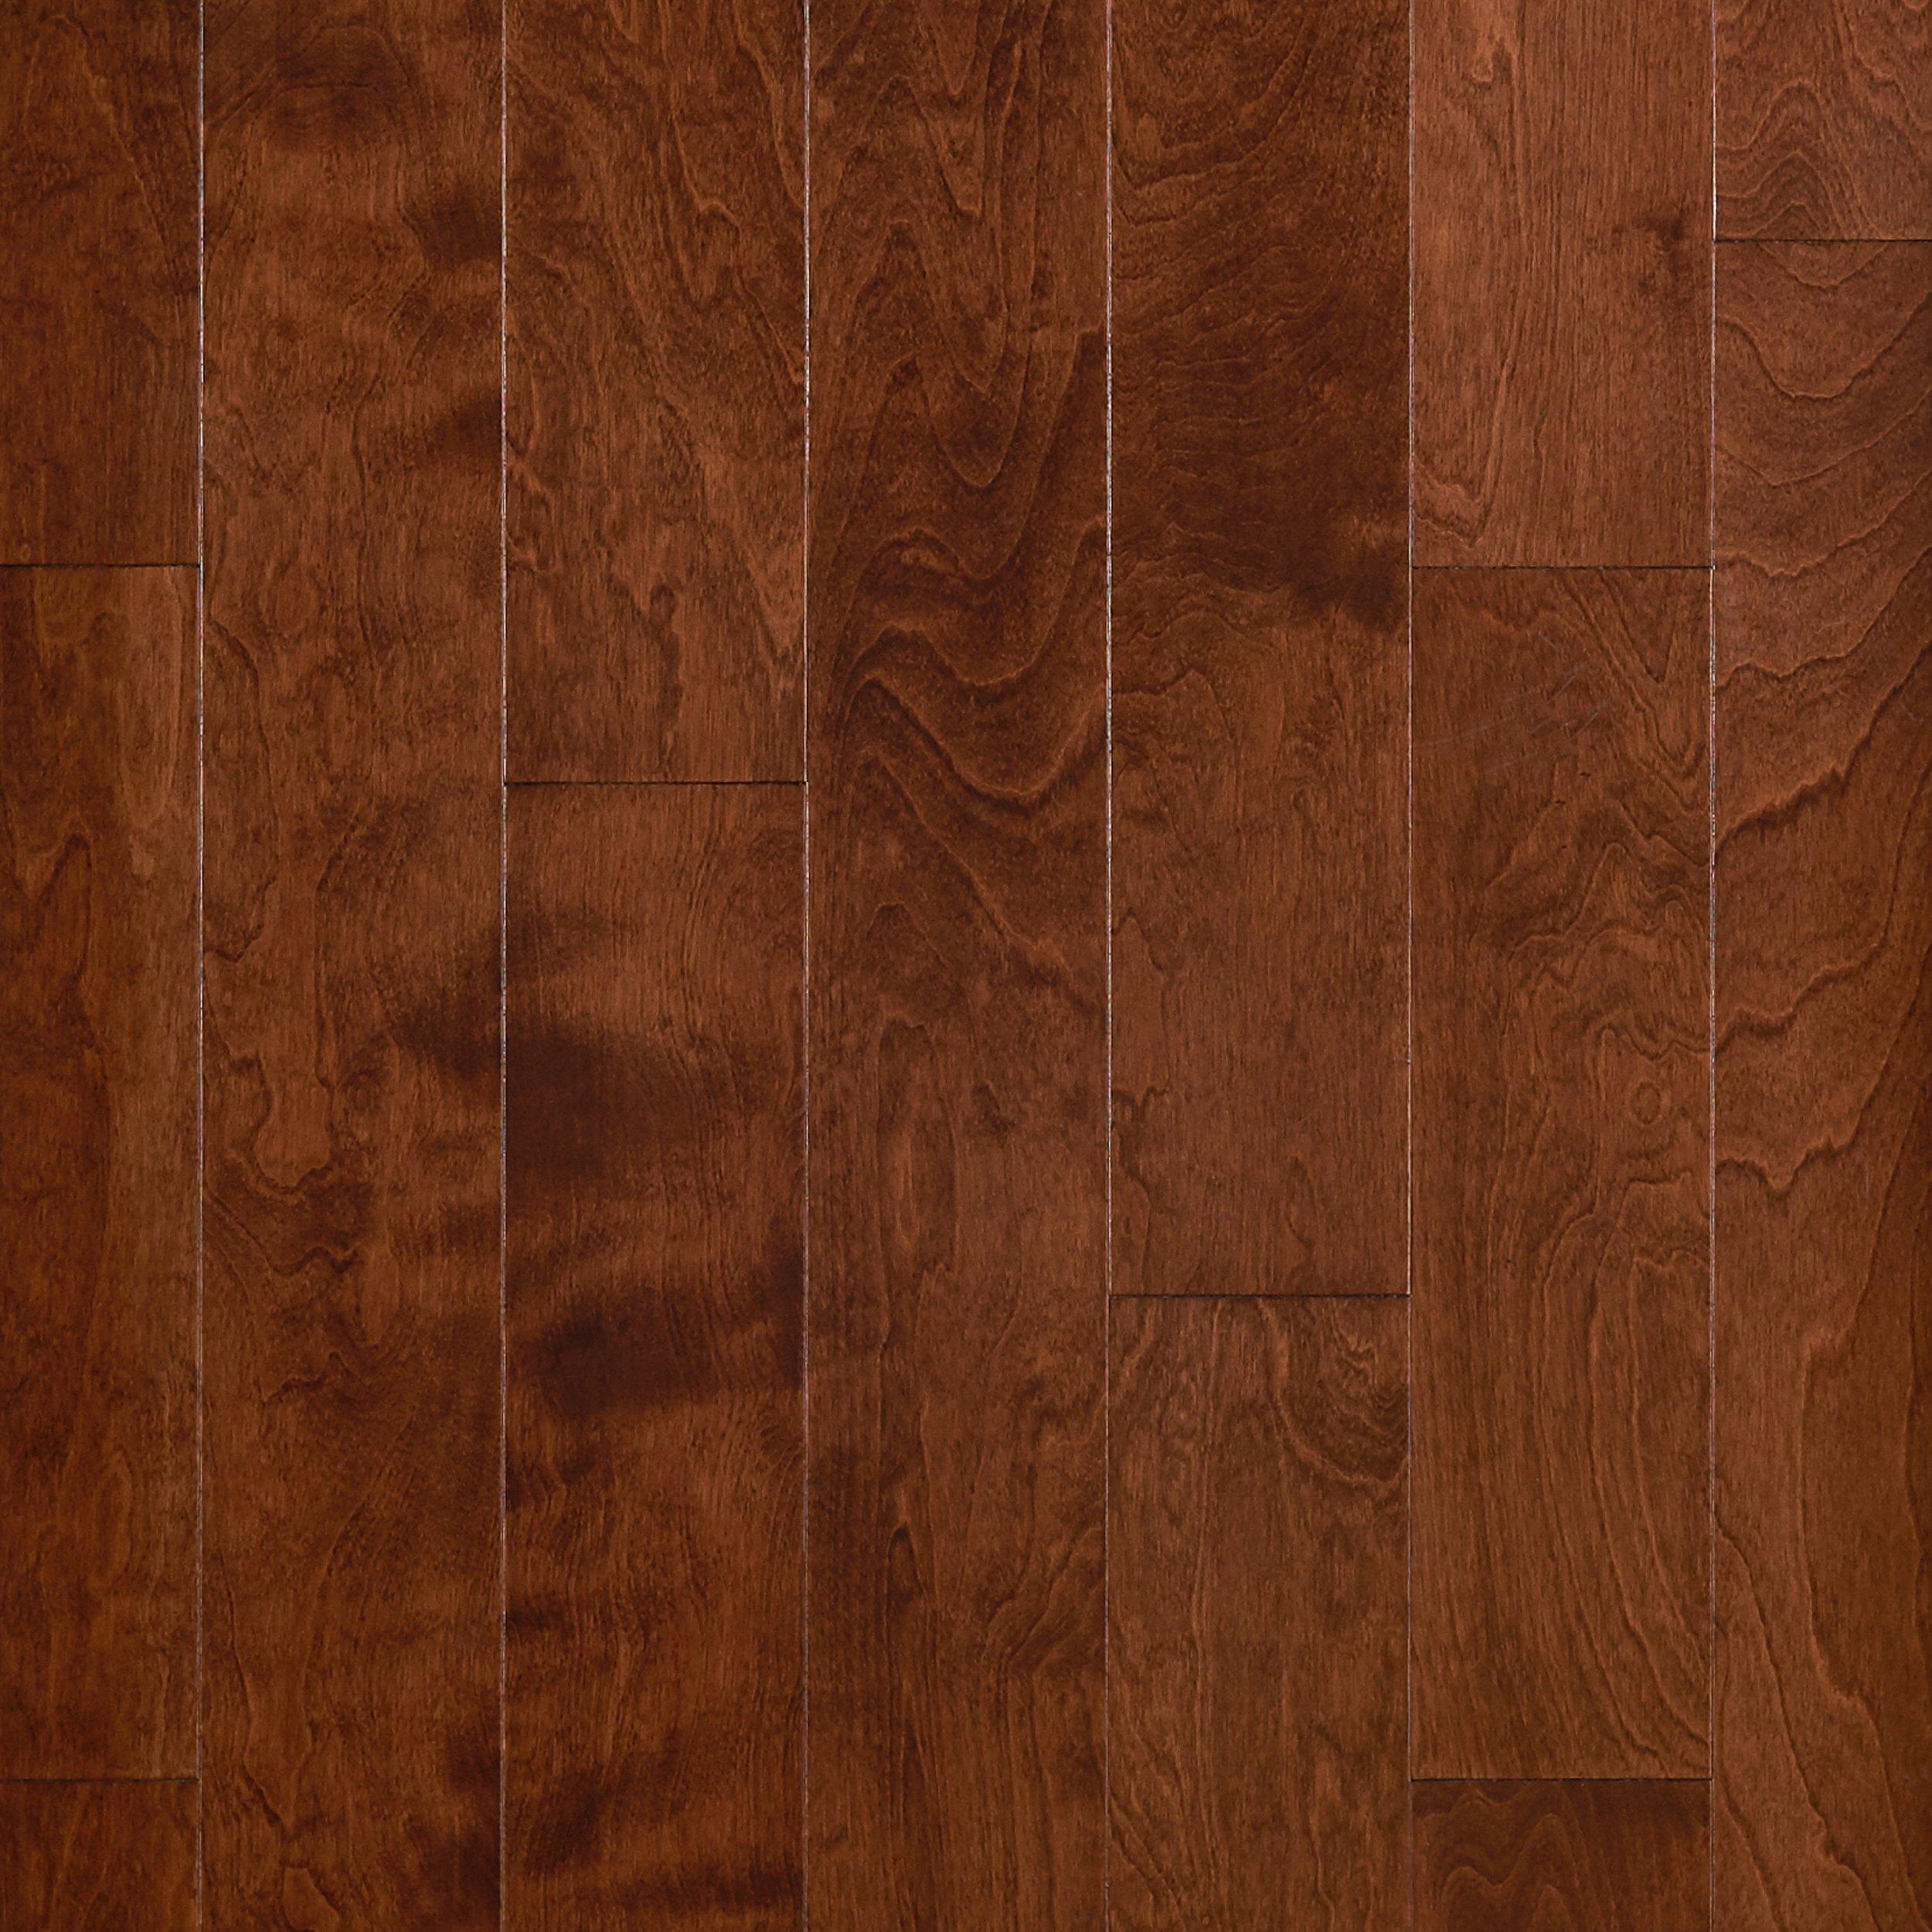 Wonderful Teak Birch Smooth Engineered Hardwood   3/8in. X 5in.   941200108 | Floor  And Decor